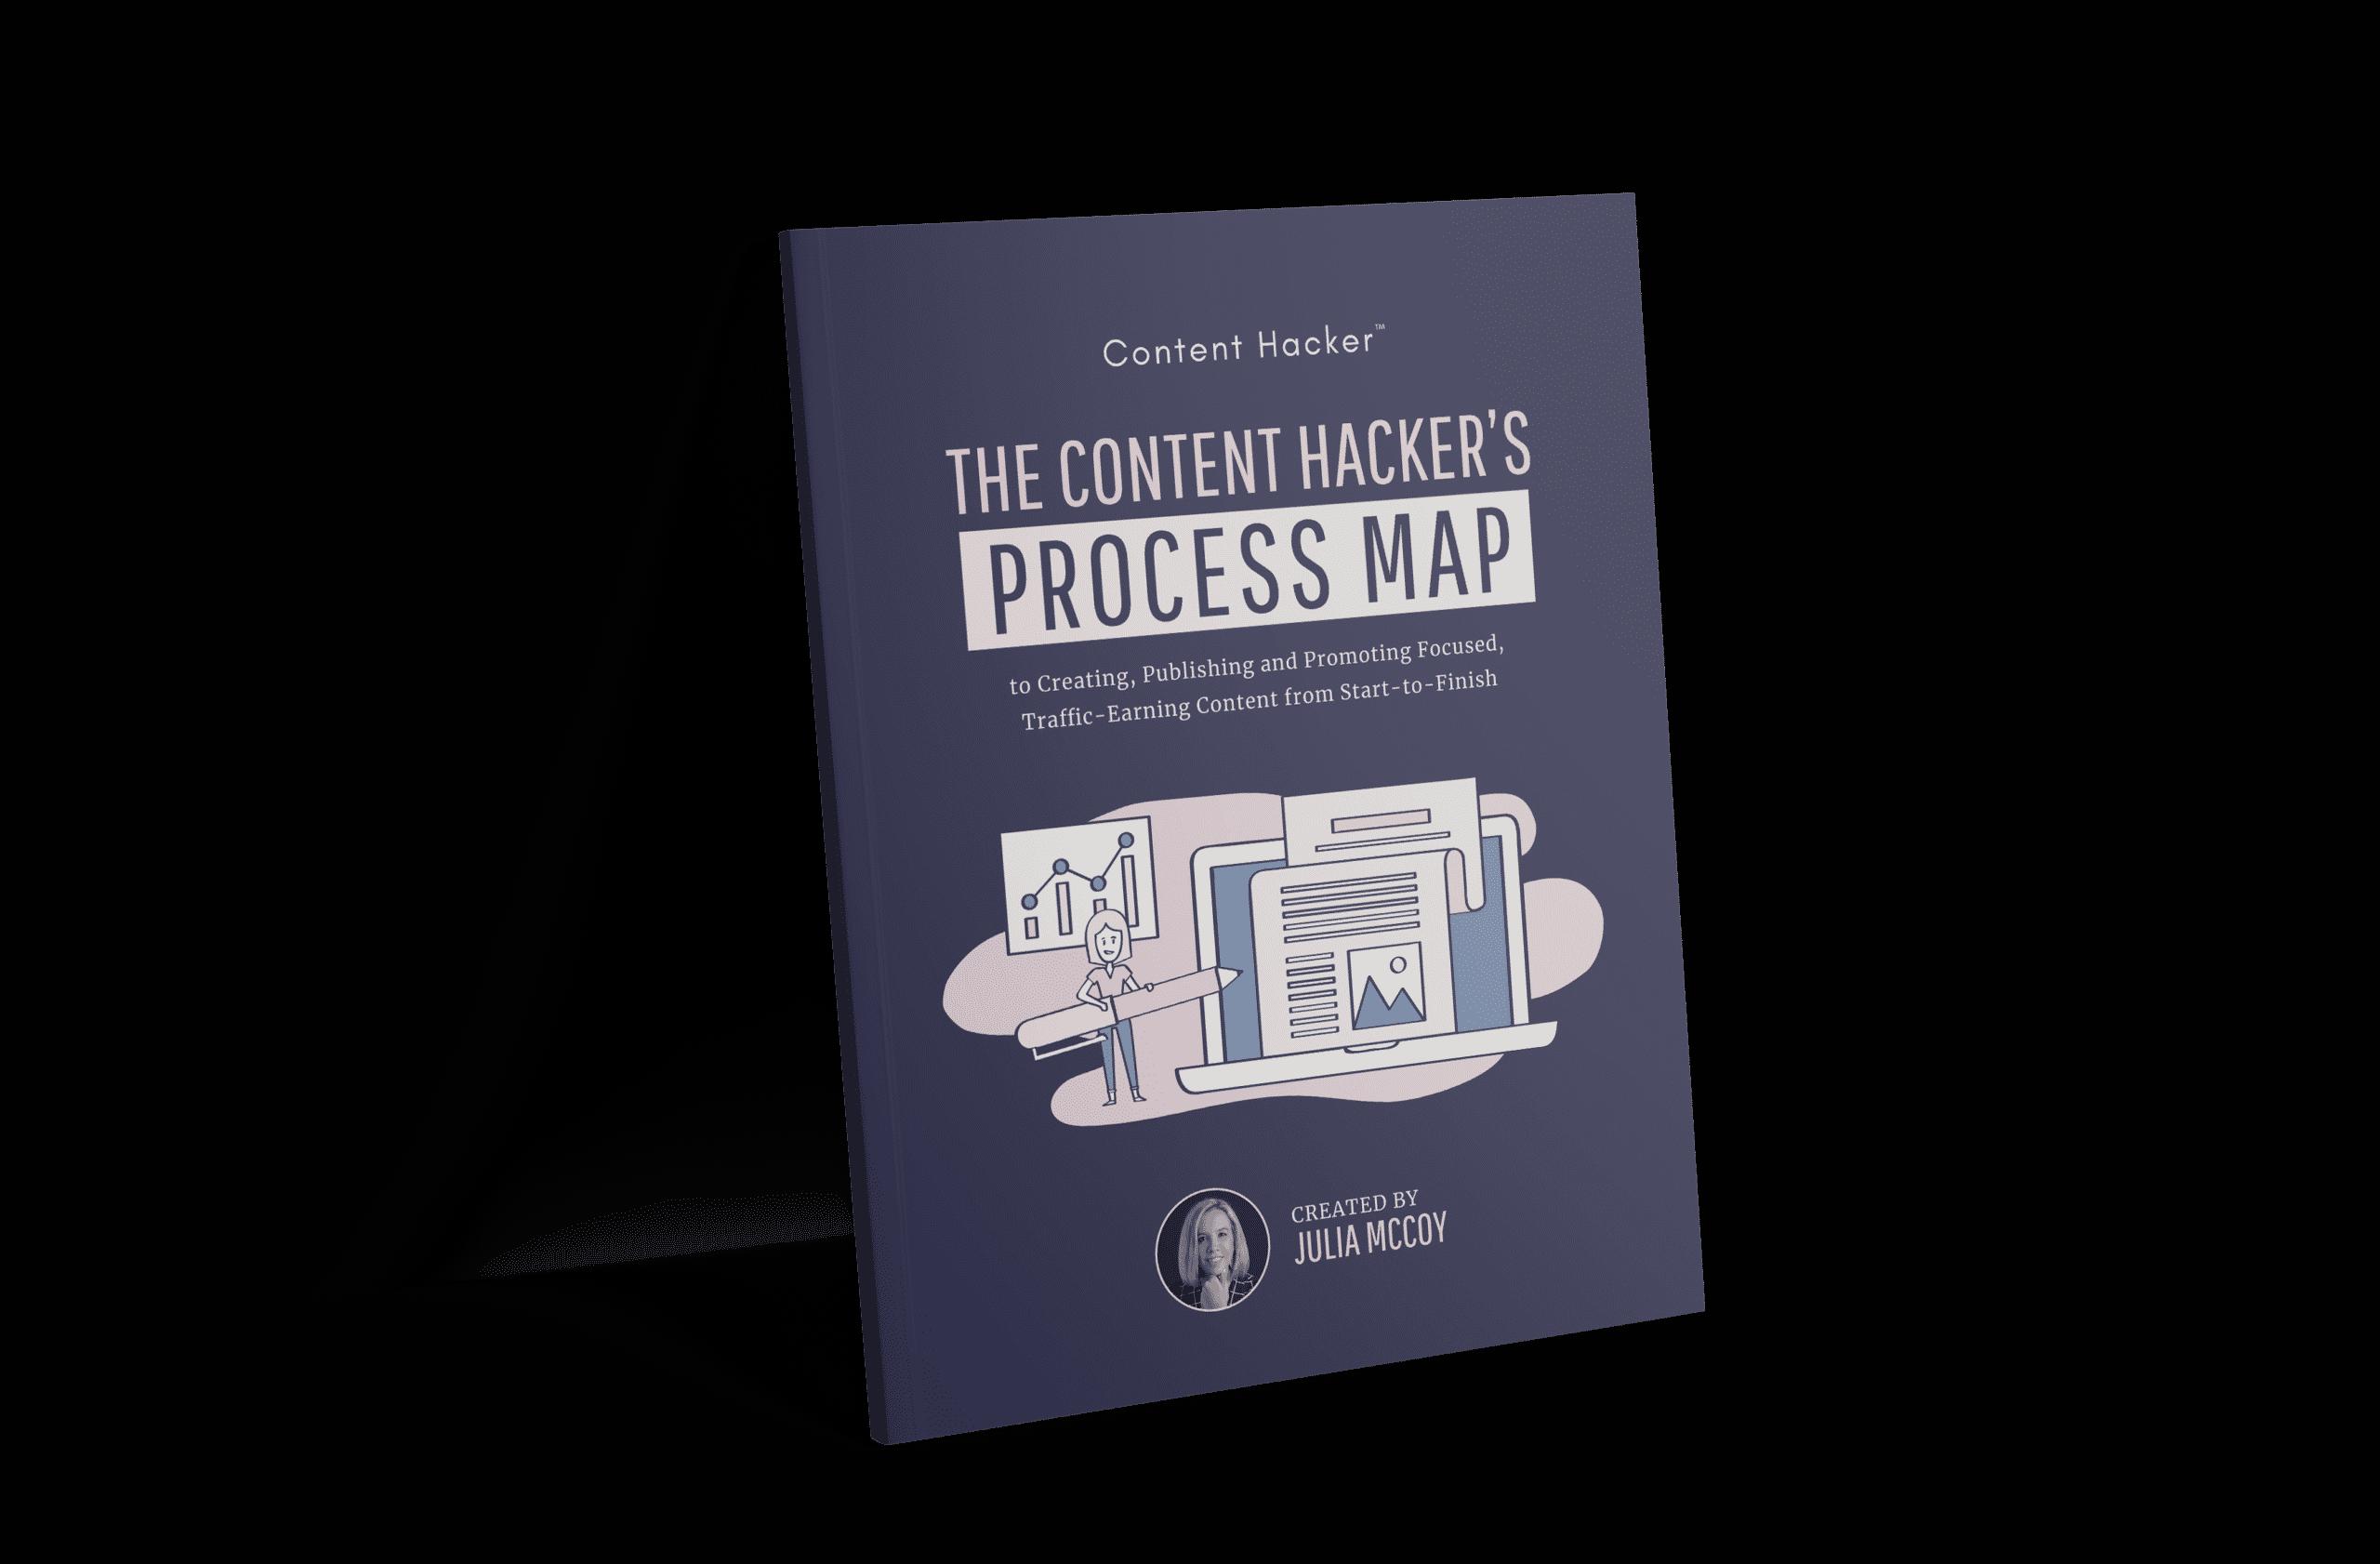 content hacker process map